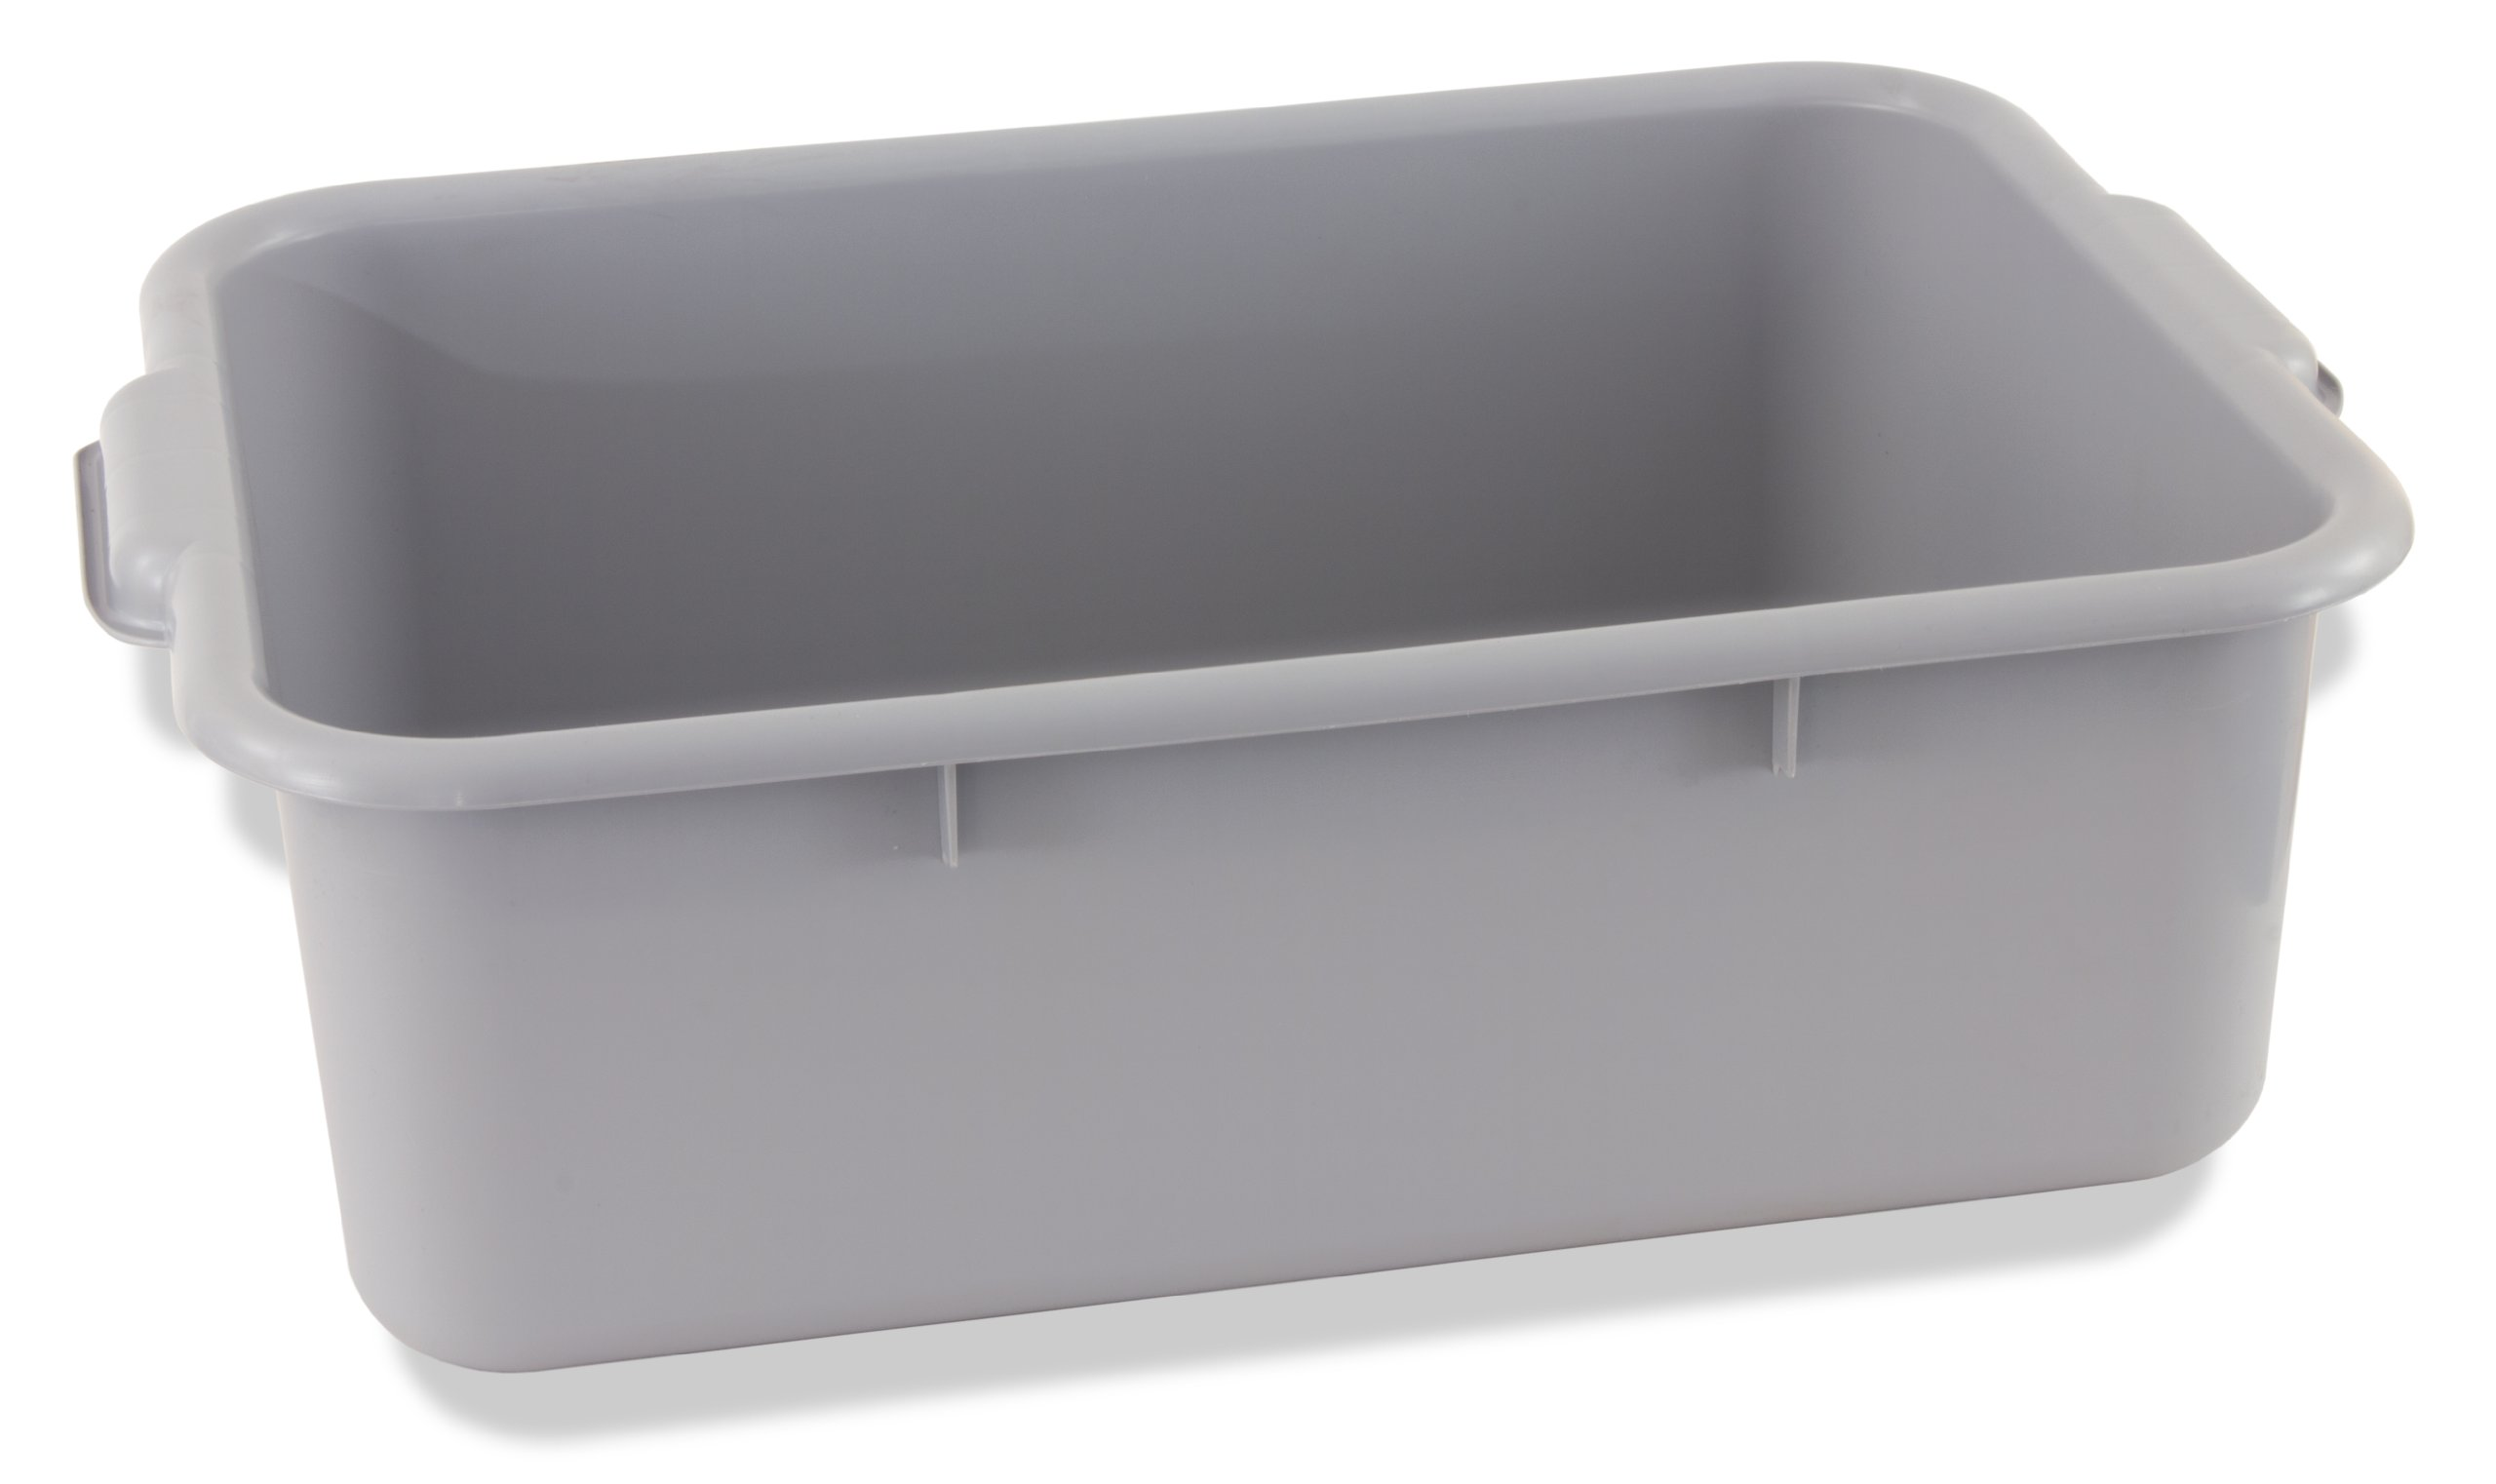 Crestware BT7GY Heavy-Weight Bus Tub, 7-Inch, Gray